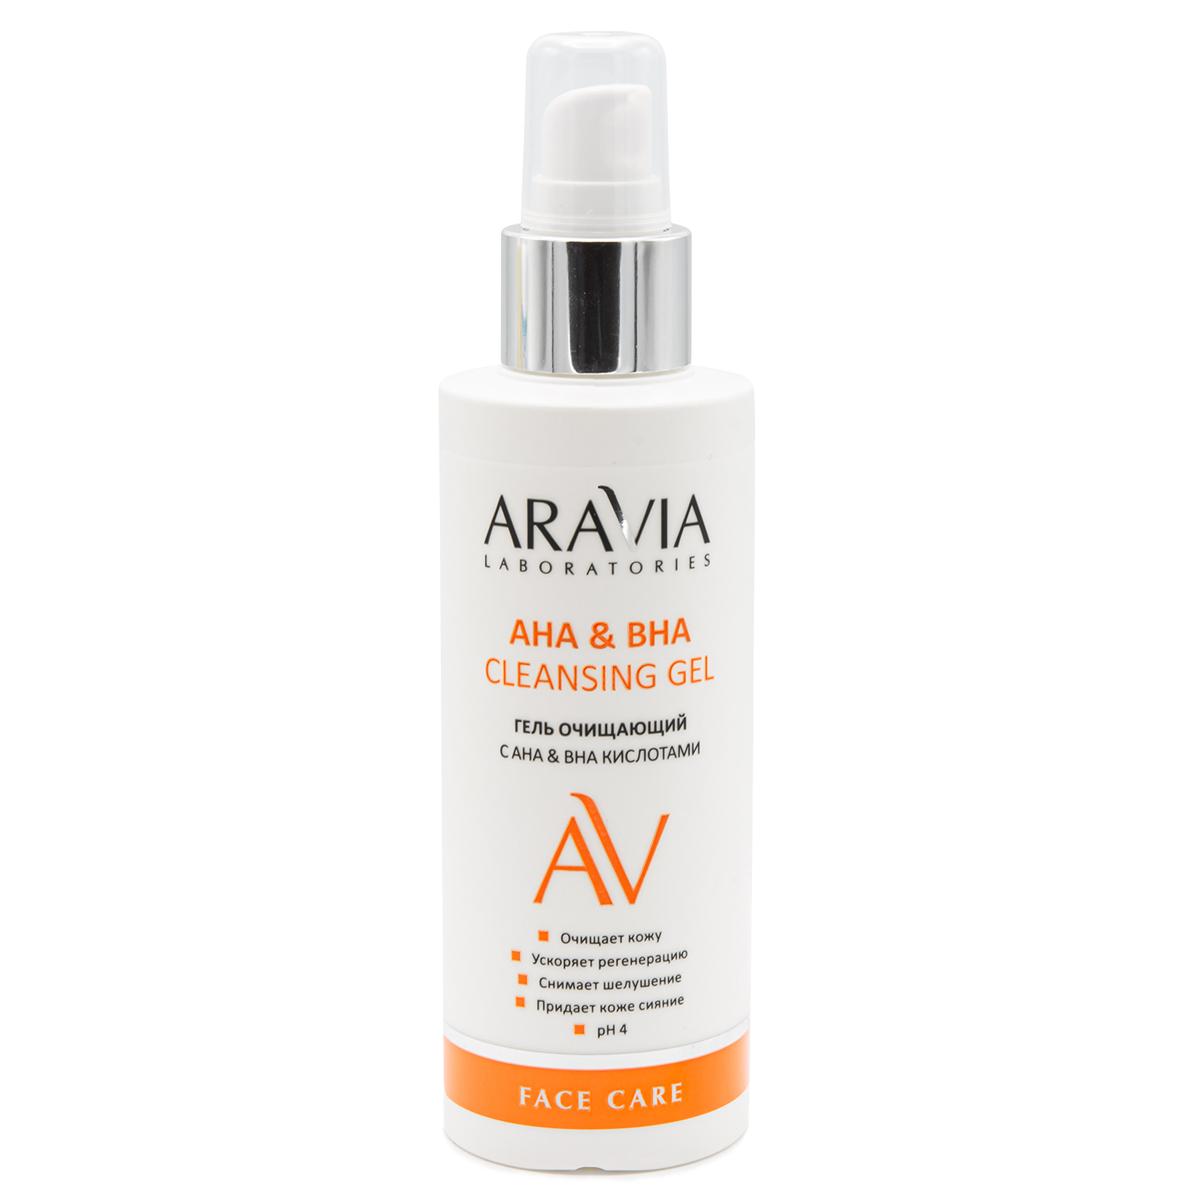 Aravia Laboratories Гель очищающий с АНА и ВНА кислотами, 150 мл (Aravia Laboratories, Уход за лицом)